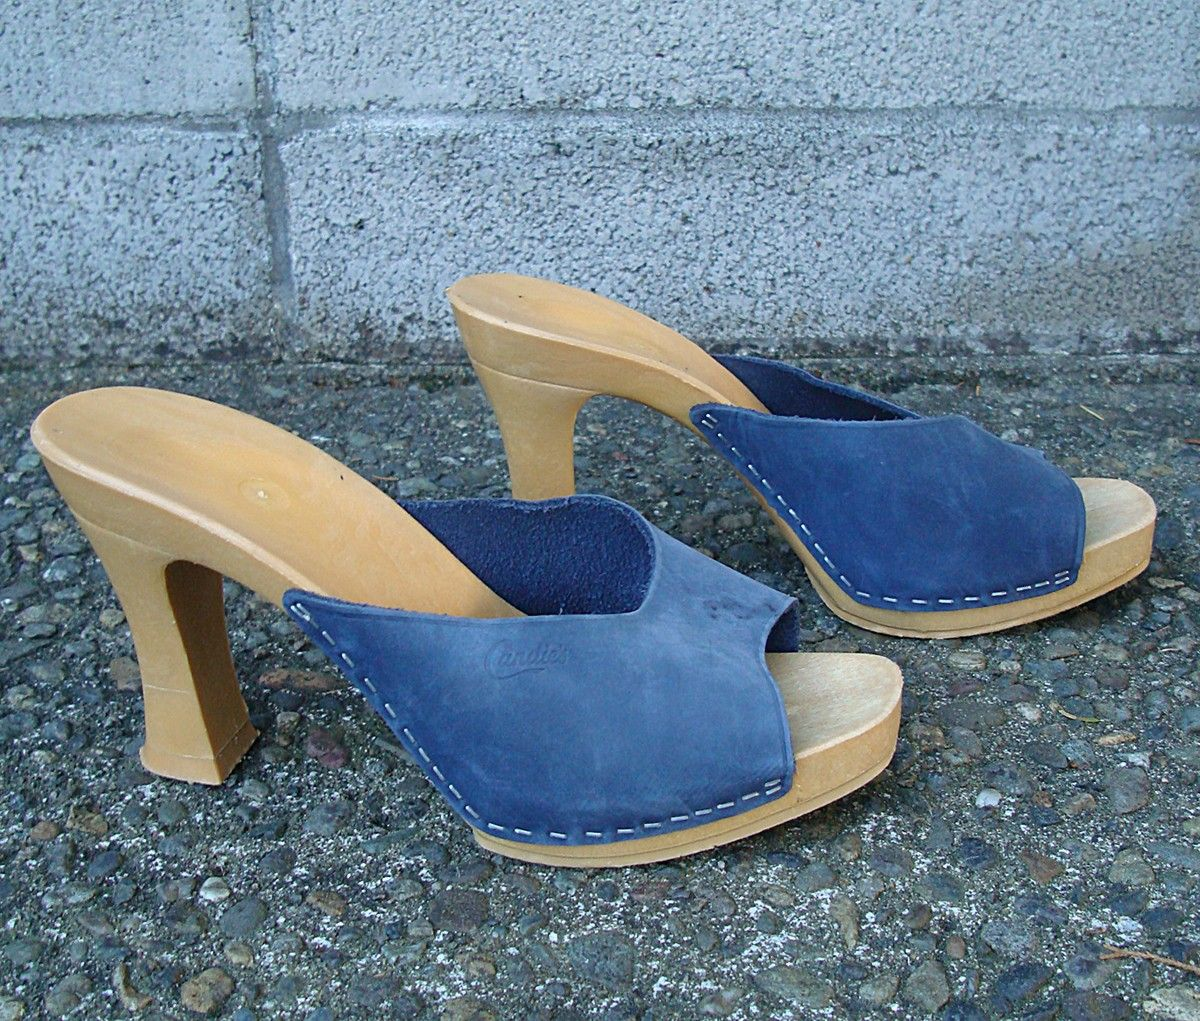 Candies heels, Vintage shoes, 1980s fashion